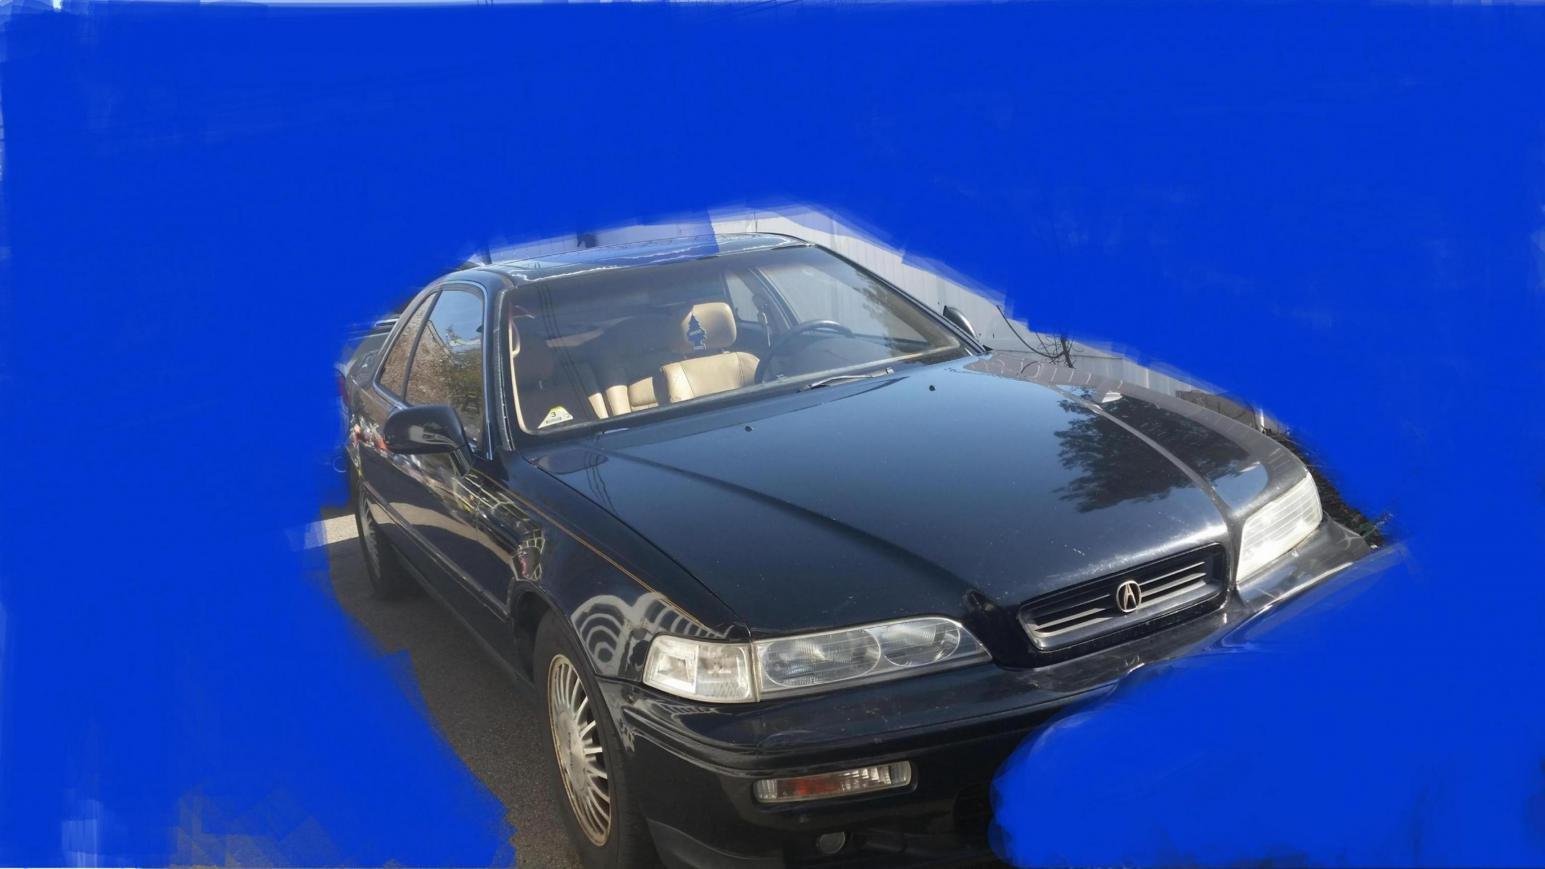 95 Legend coupe 00/bo-20171114_174600_1523927366888.jpg